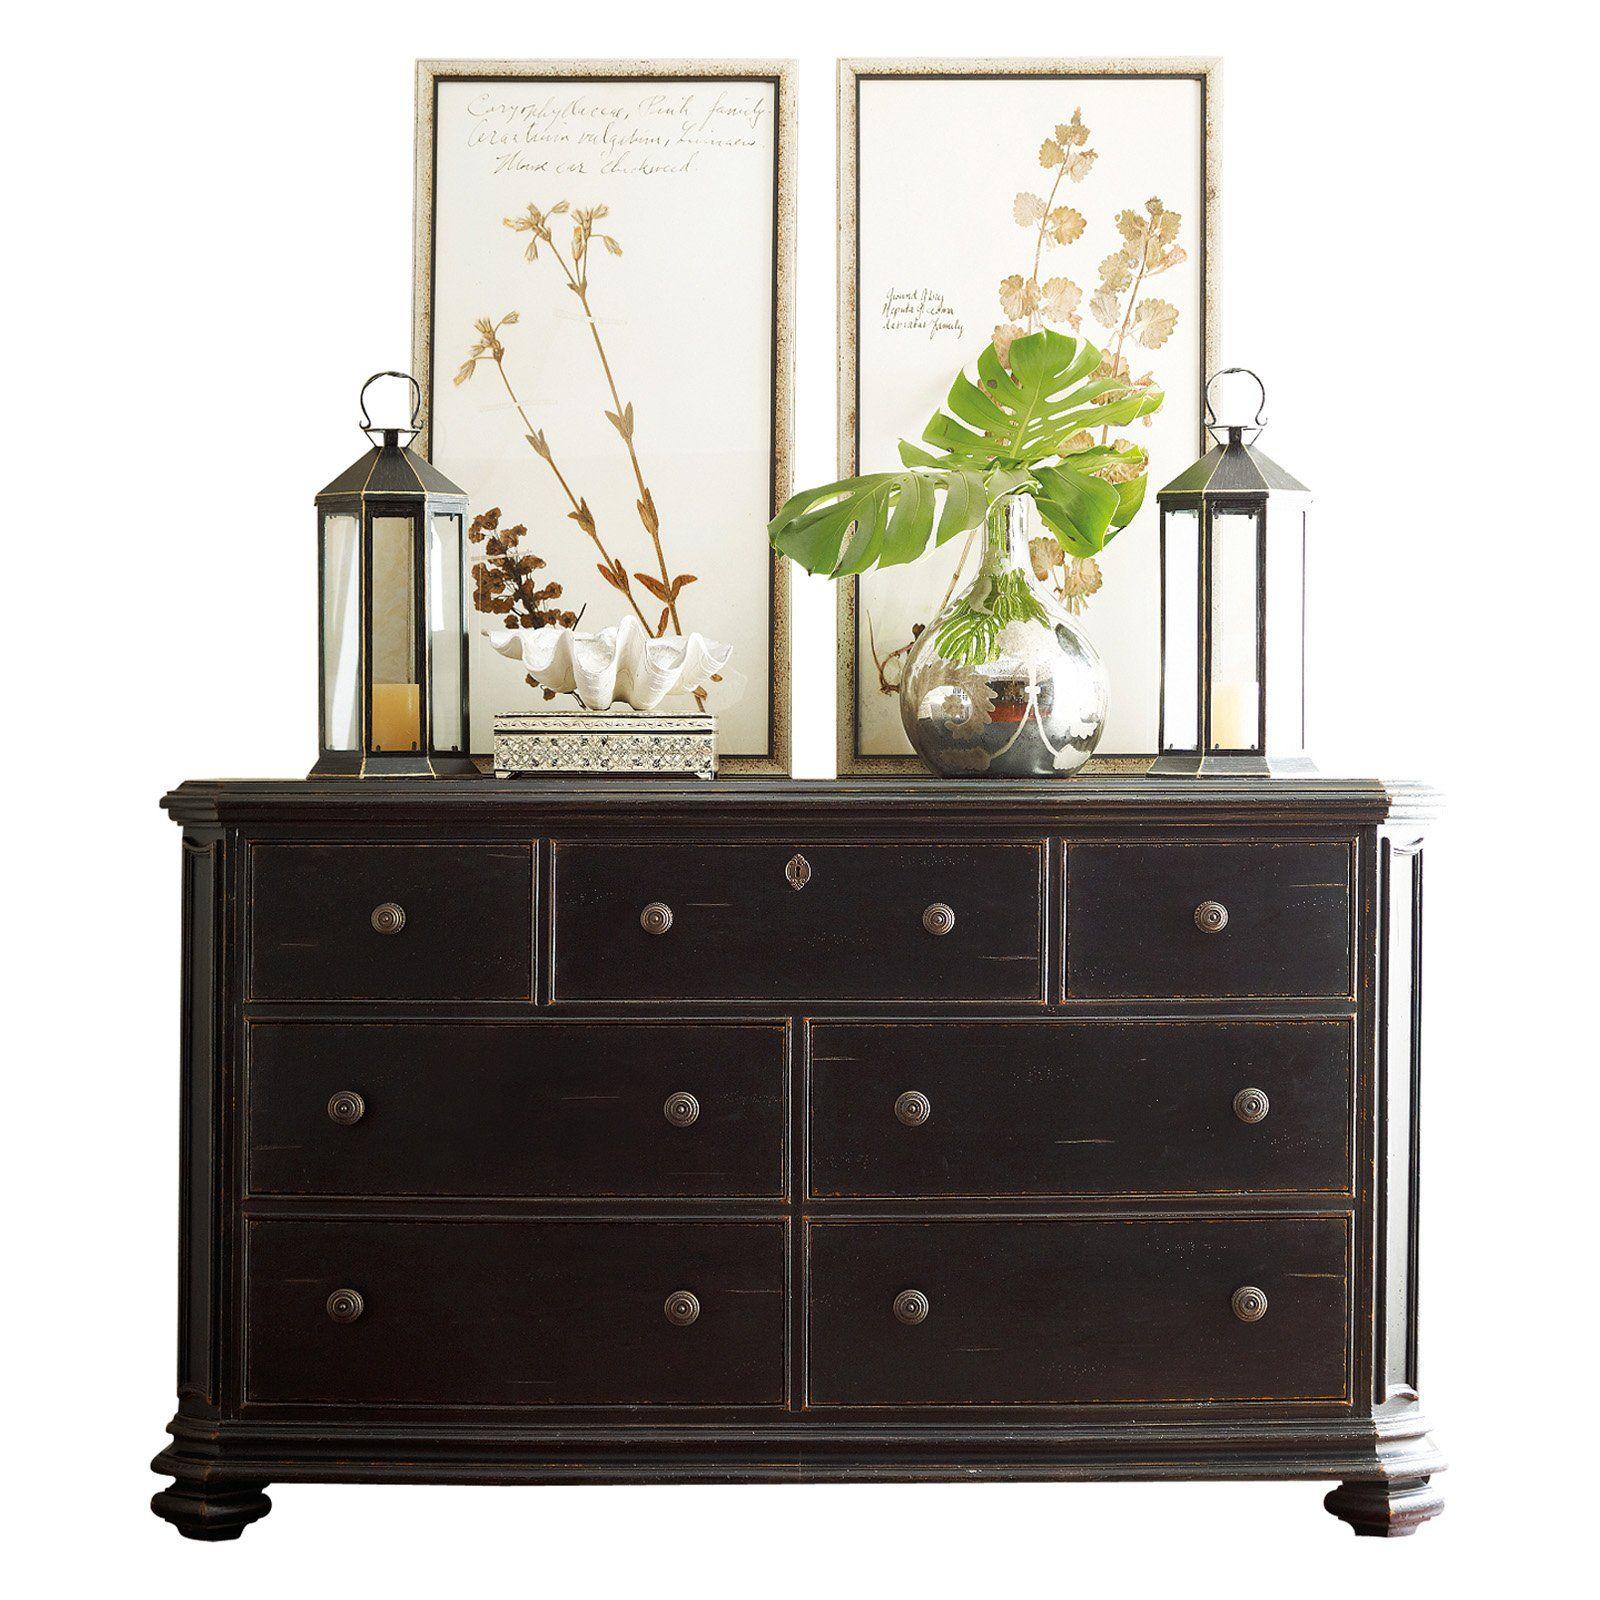 Stanley Continental Bedroom Triple Dresser Ebony 128-83-05 - $1719 @hayneedle. Guest room dresser?